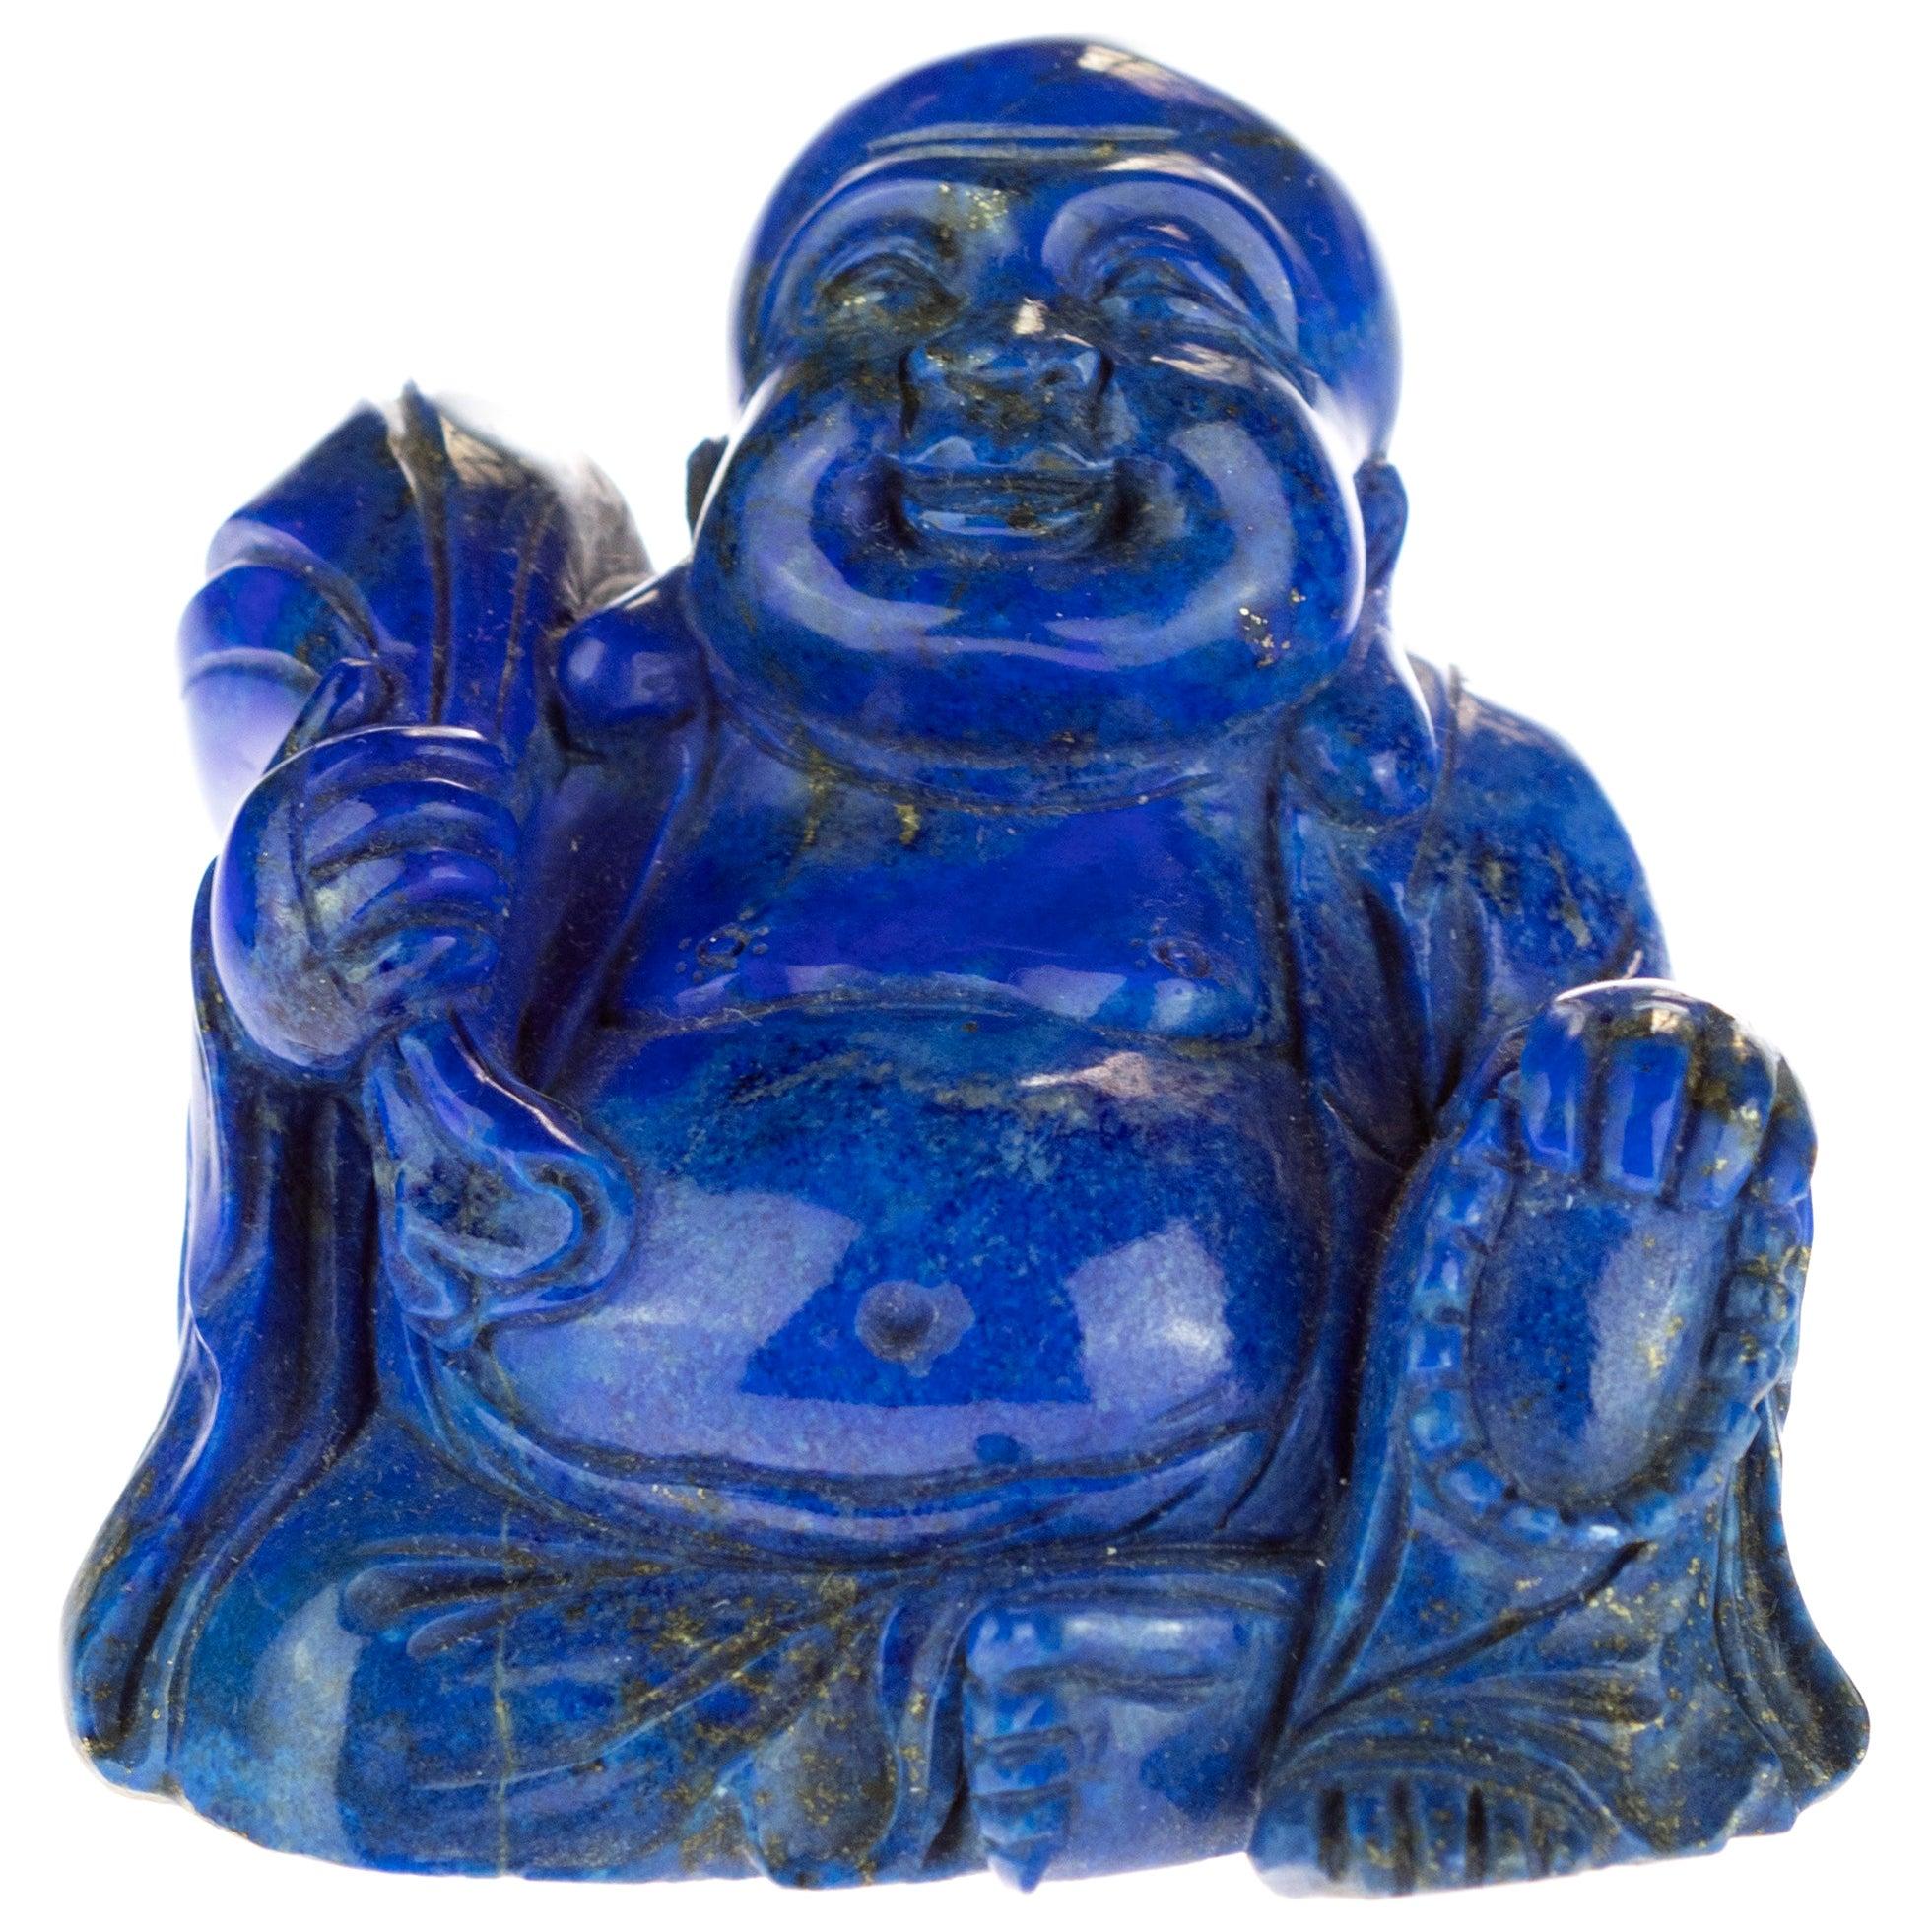 Lapis Lazuli Meditation Buddha Carved Gemstone Asian Art Statue Sculpture